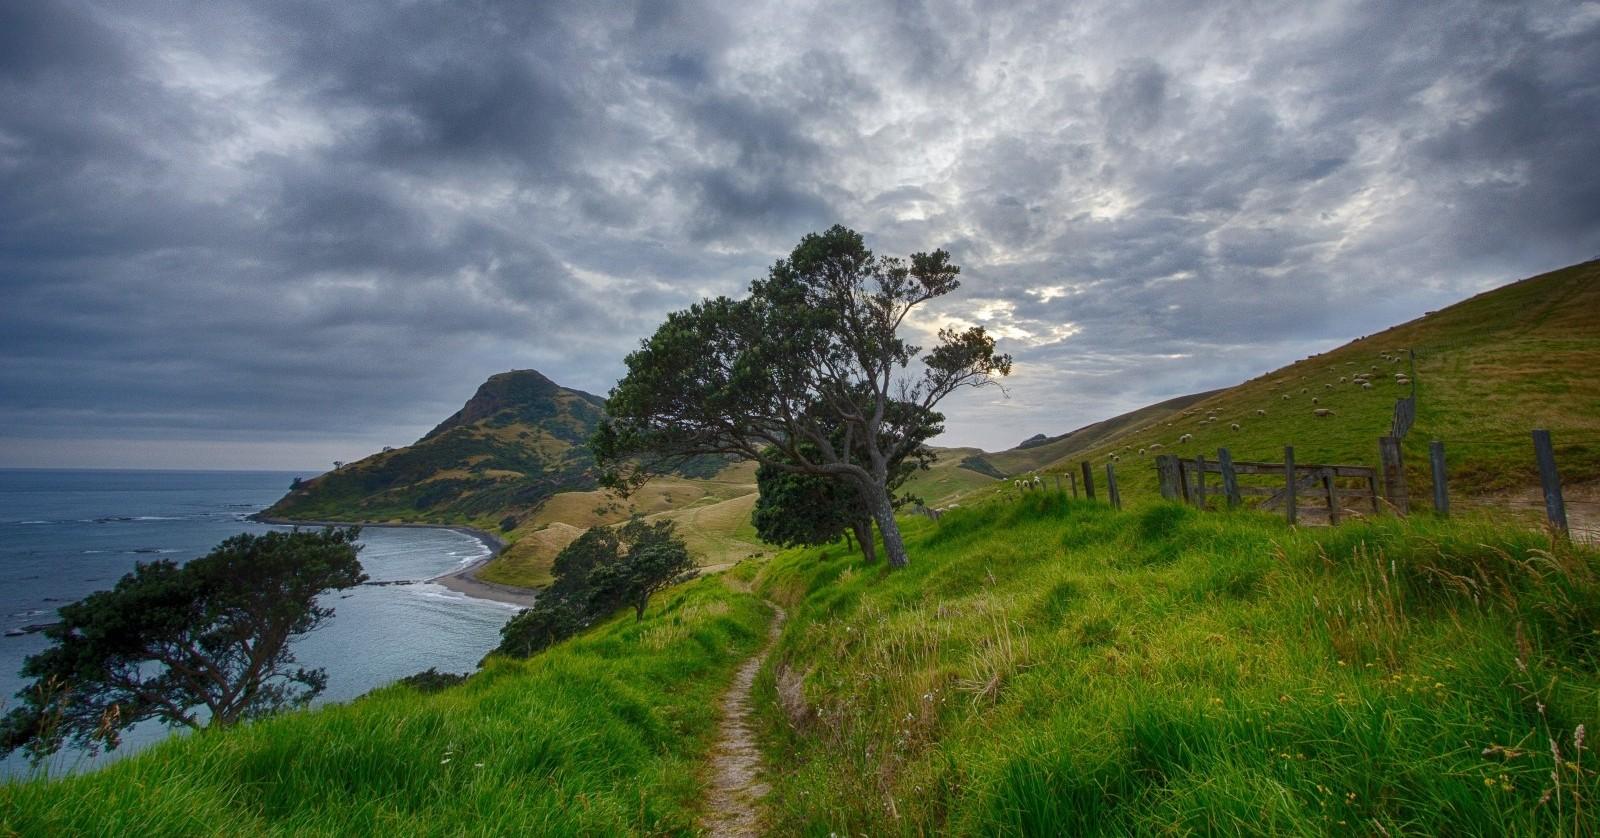 new-zealand-path-trail-corum-andel-sheep-hiking